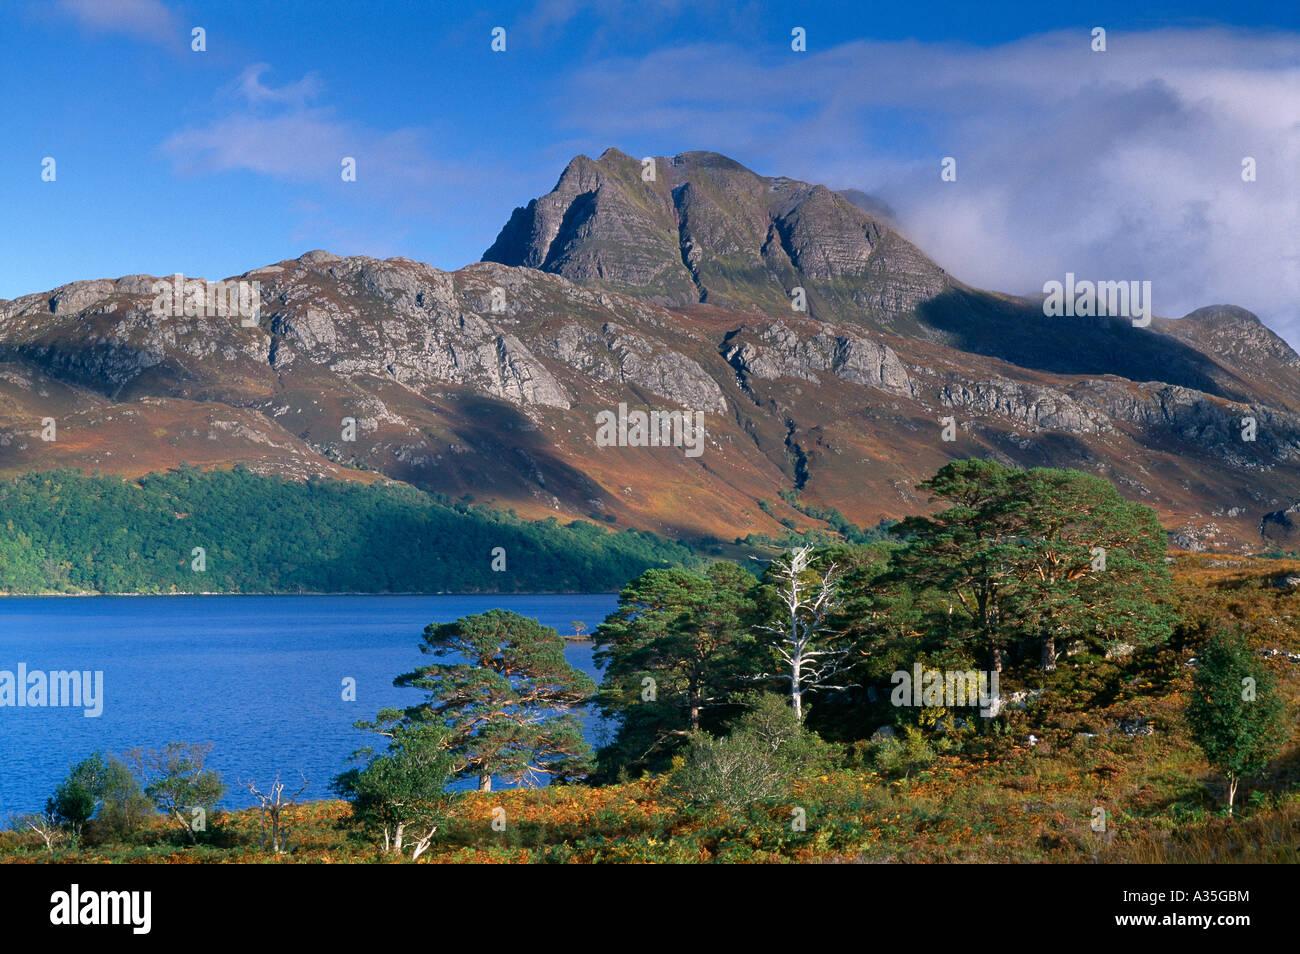 Loch Maree and Slioch Wester Ross Scotland UK - Stock Image